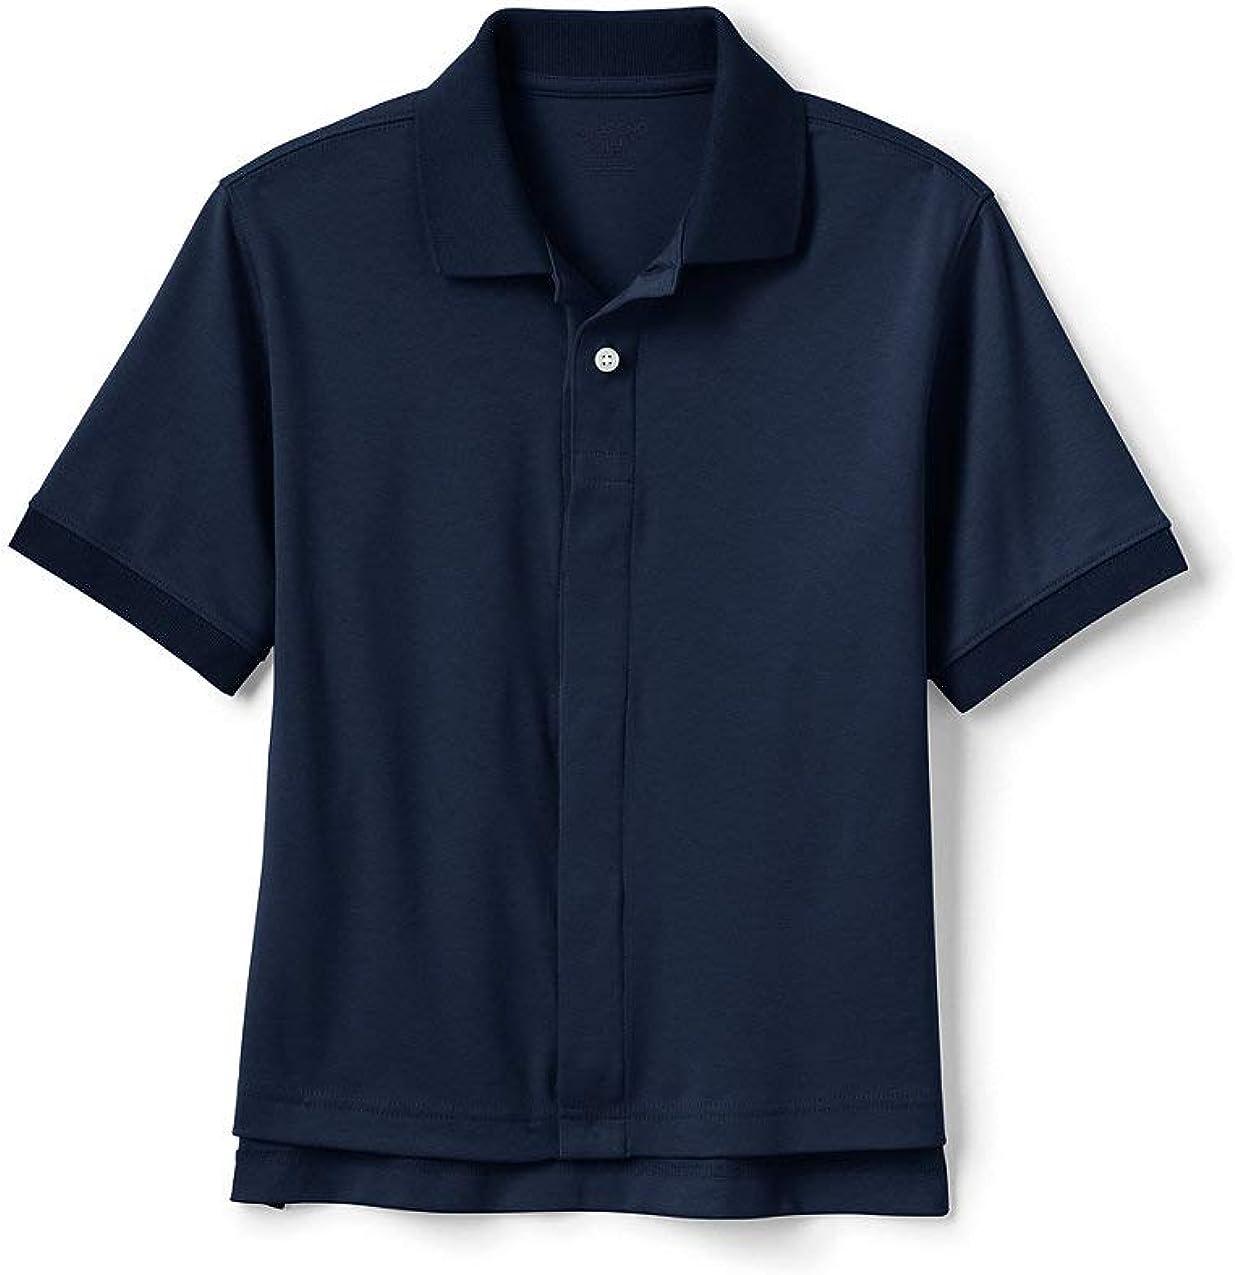 Lands' End School Uniform Kids Adaptive Short Sleeve Interlock Polo Shirt